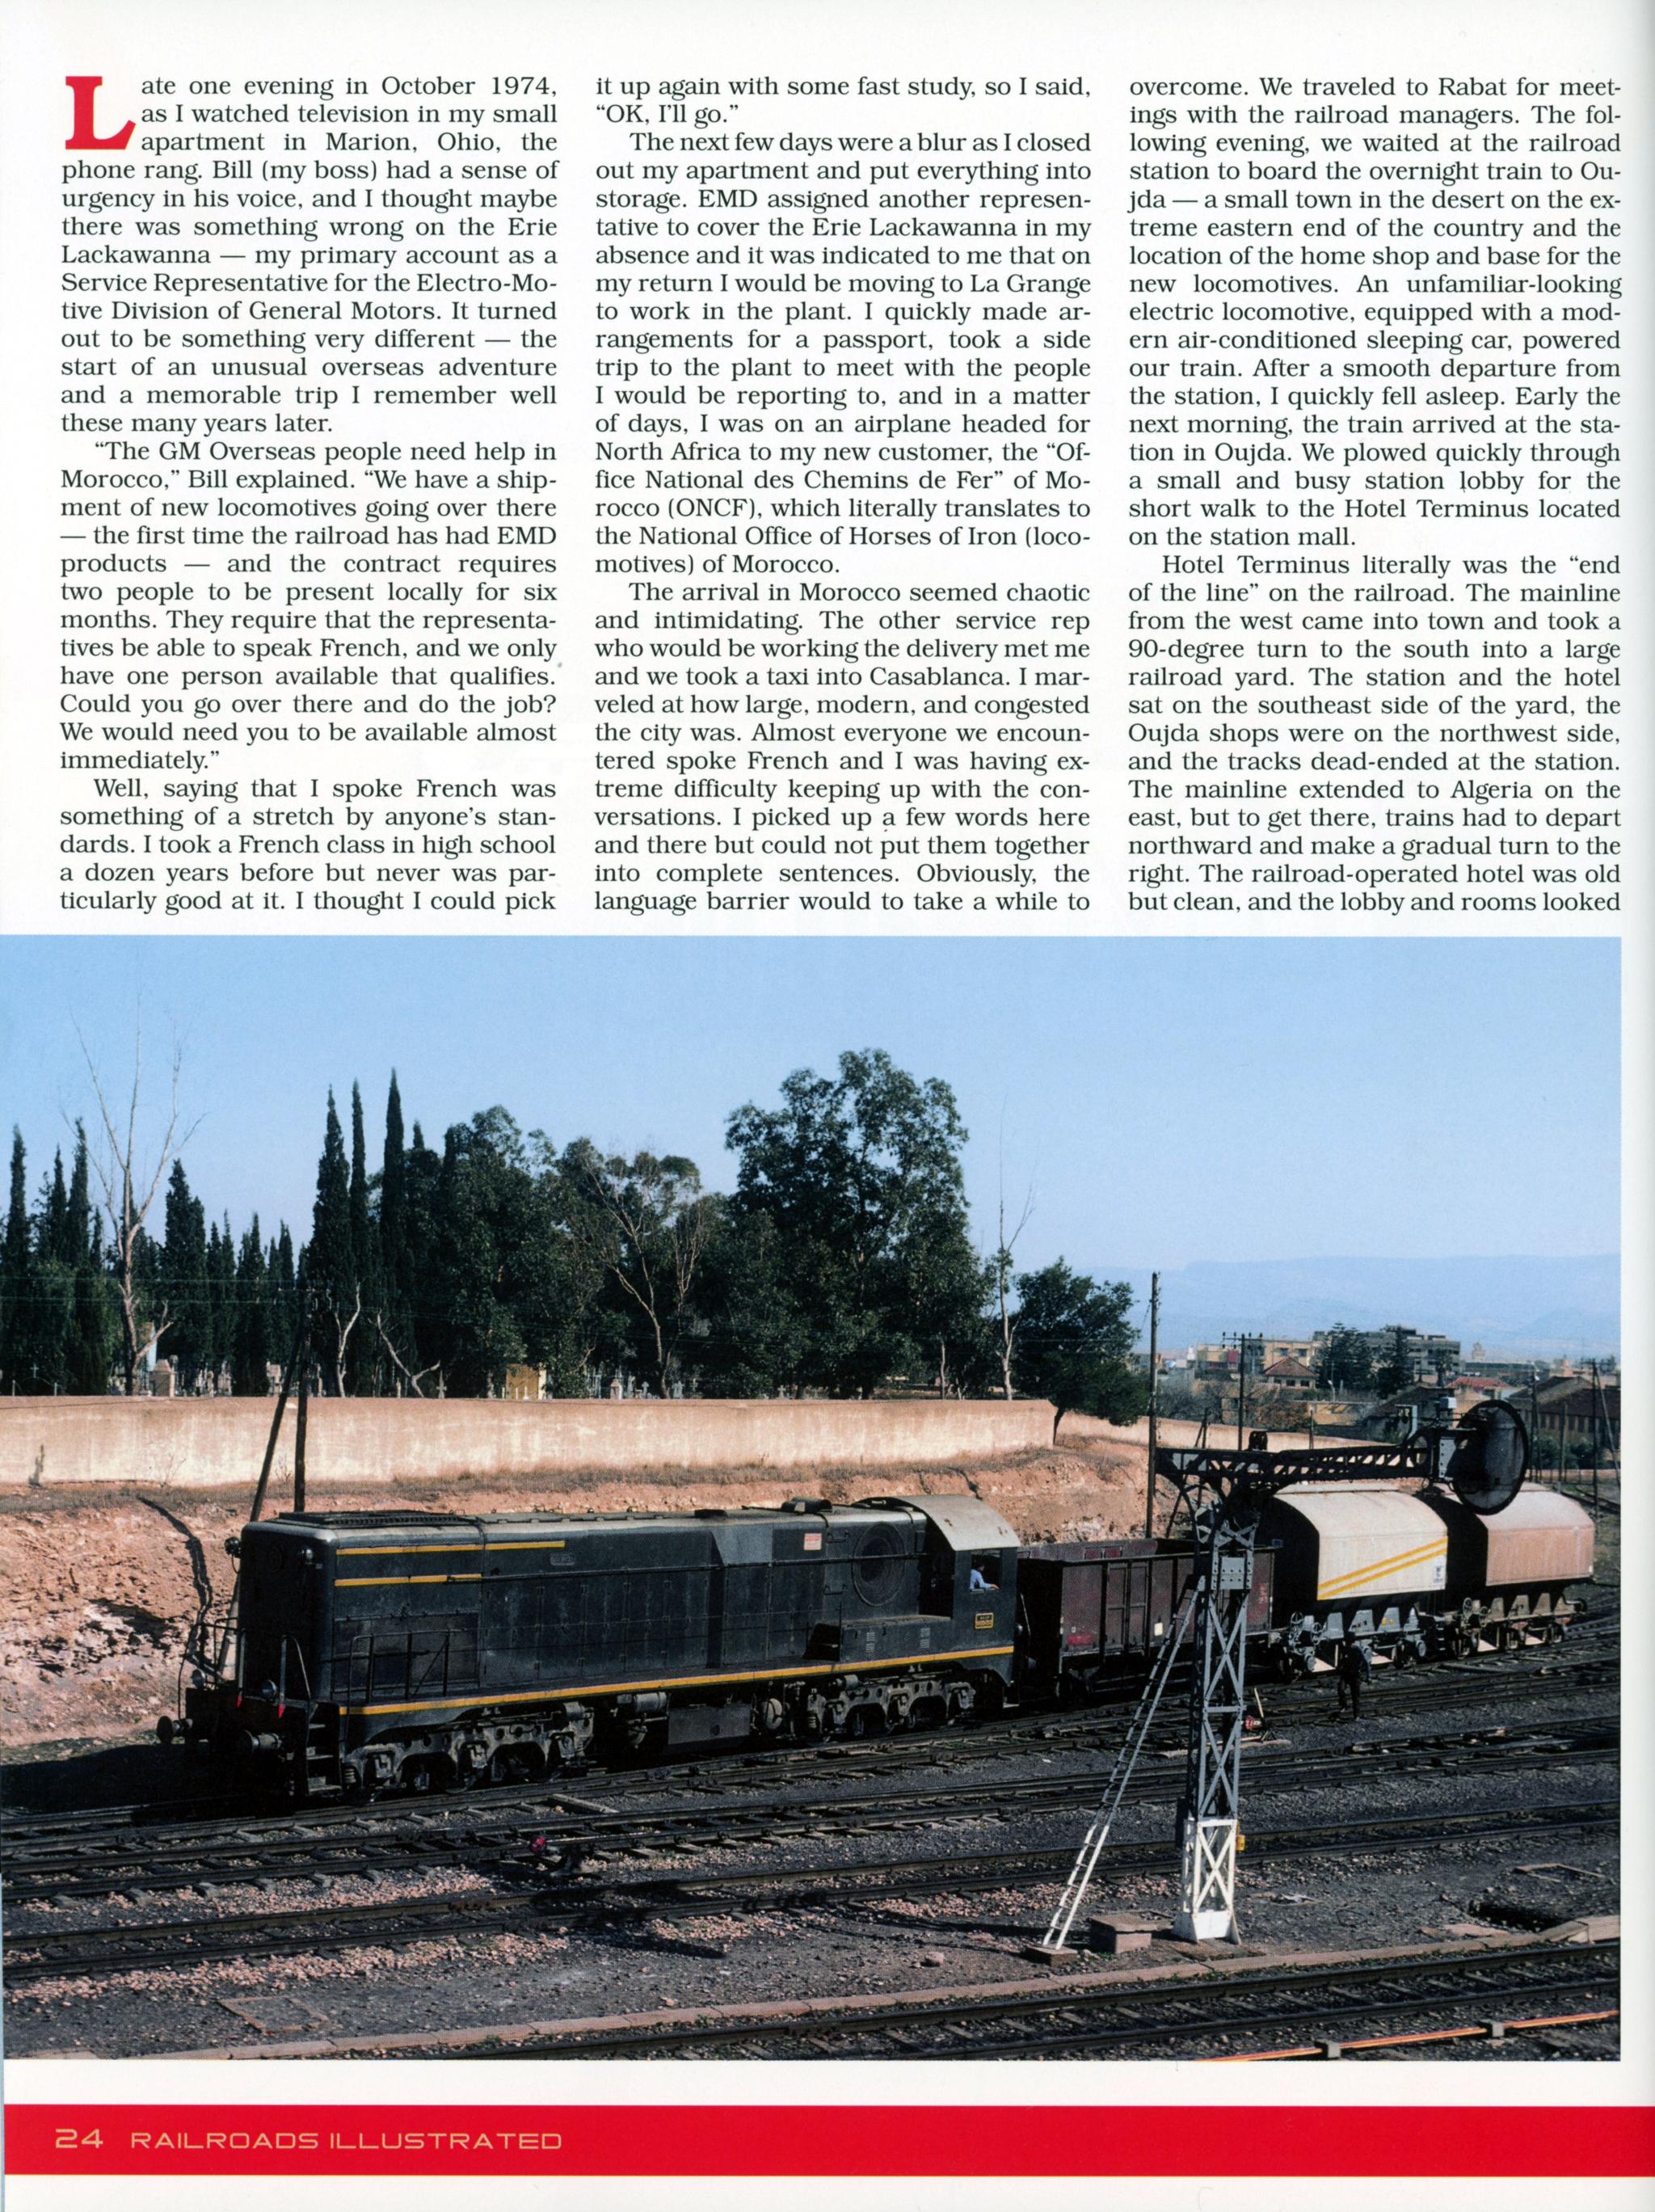 Chemins de Fer au Maroc - ONCF  - Page 5 49775573691_c10b1a6f1b_o_d